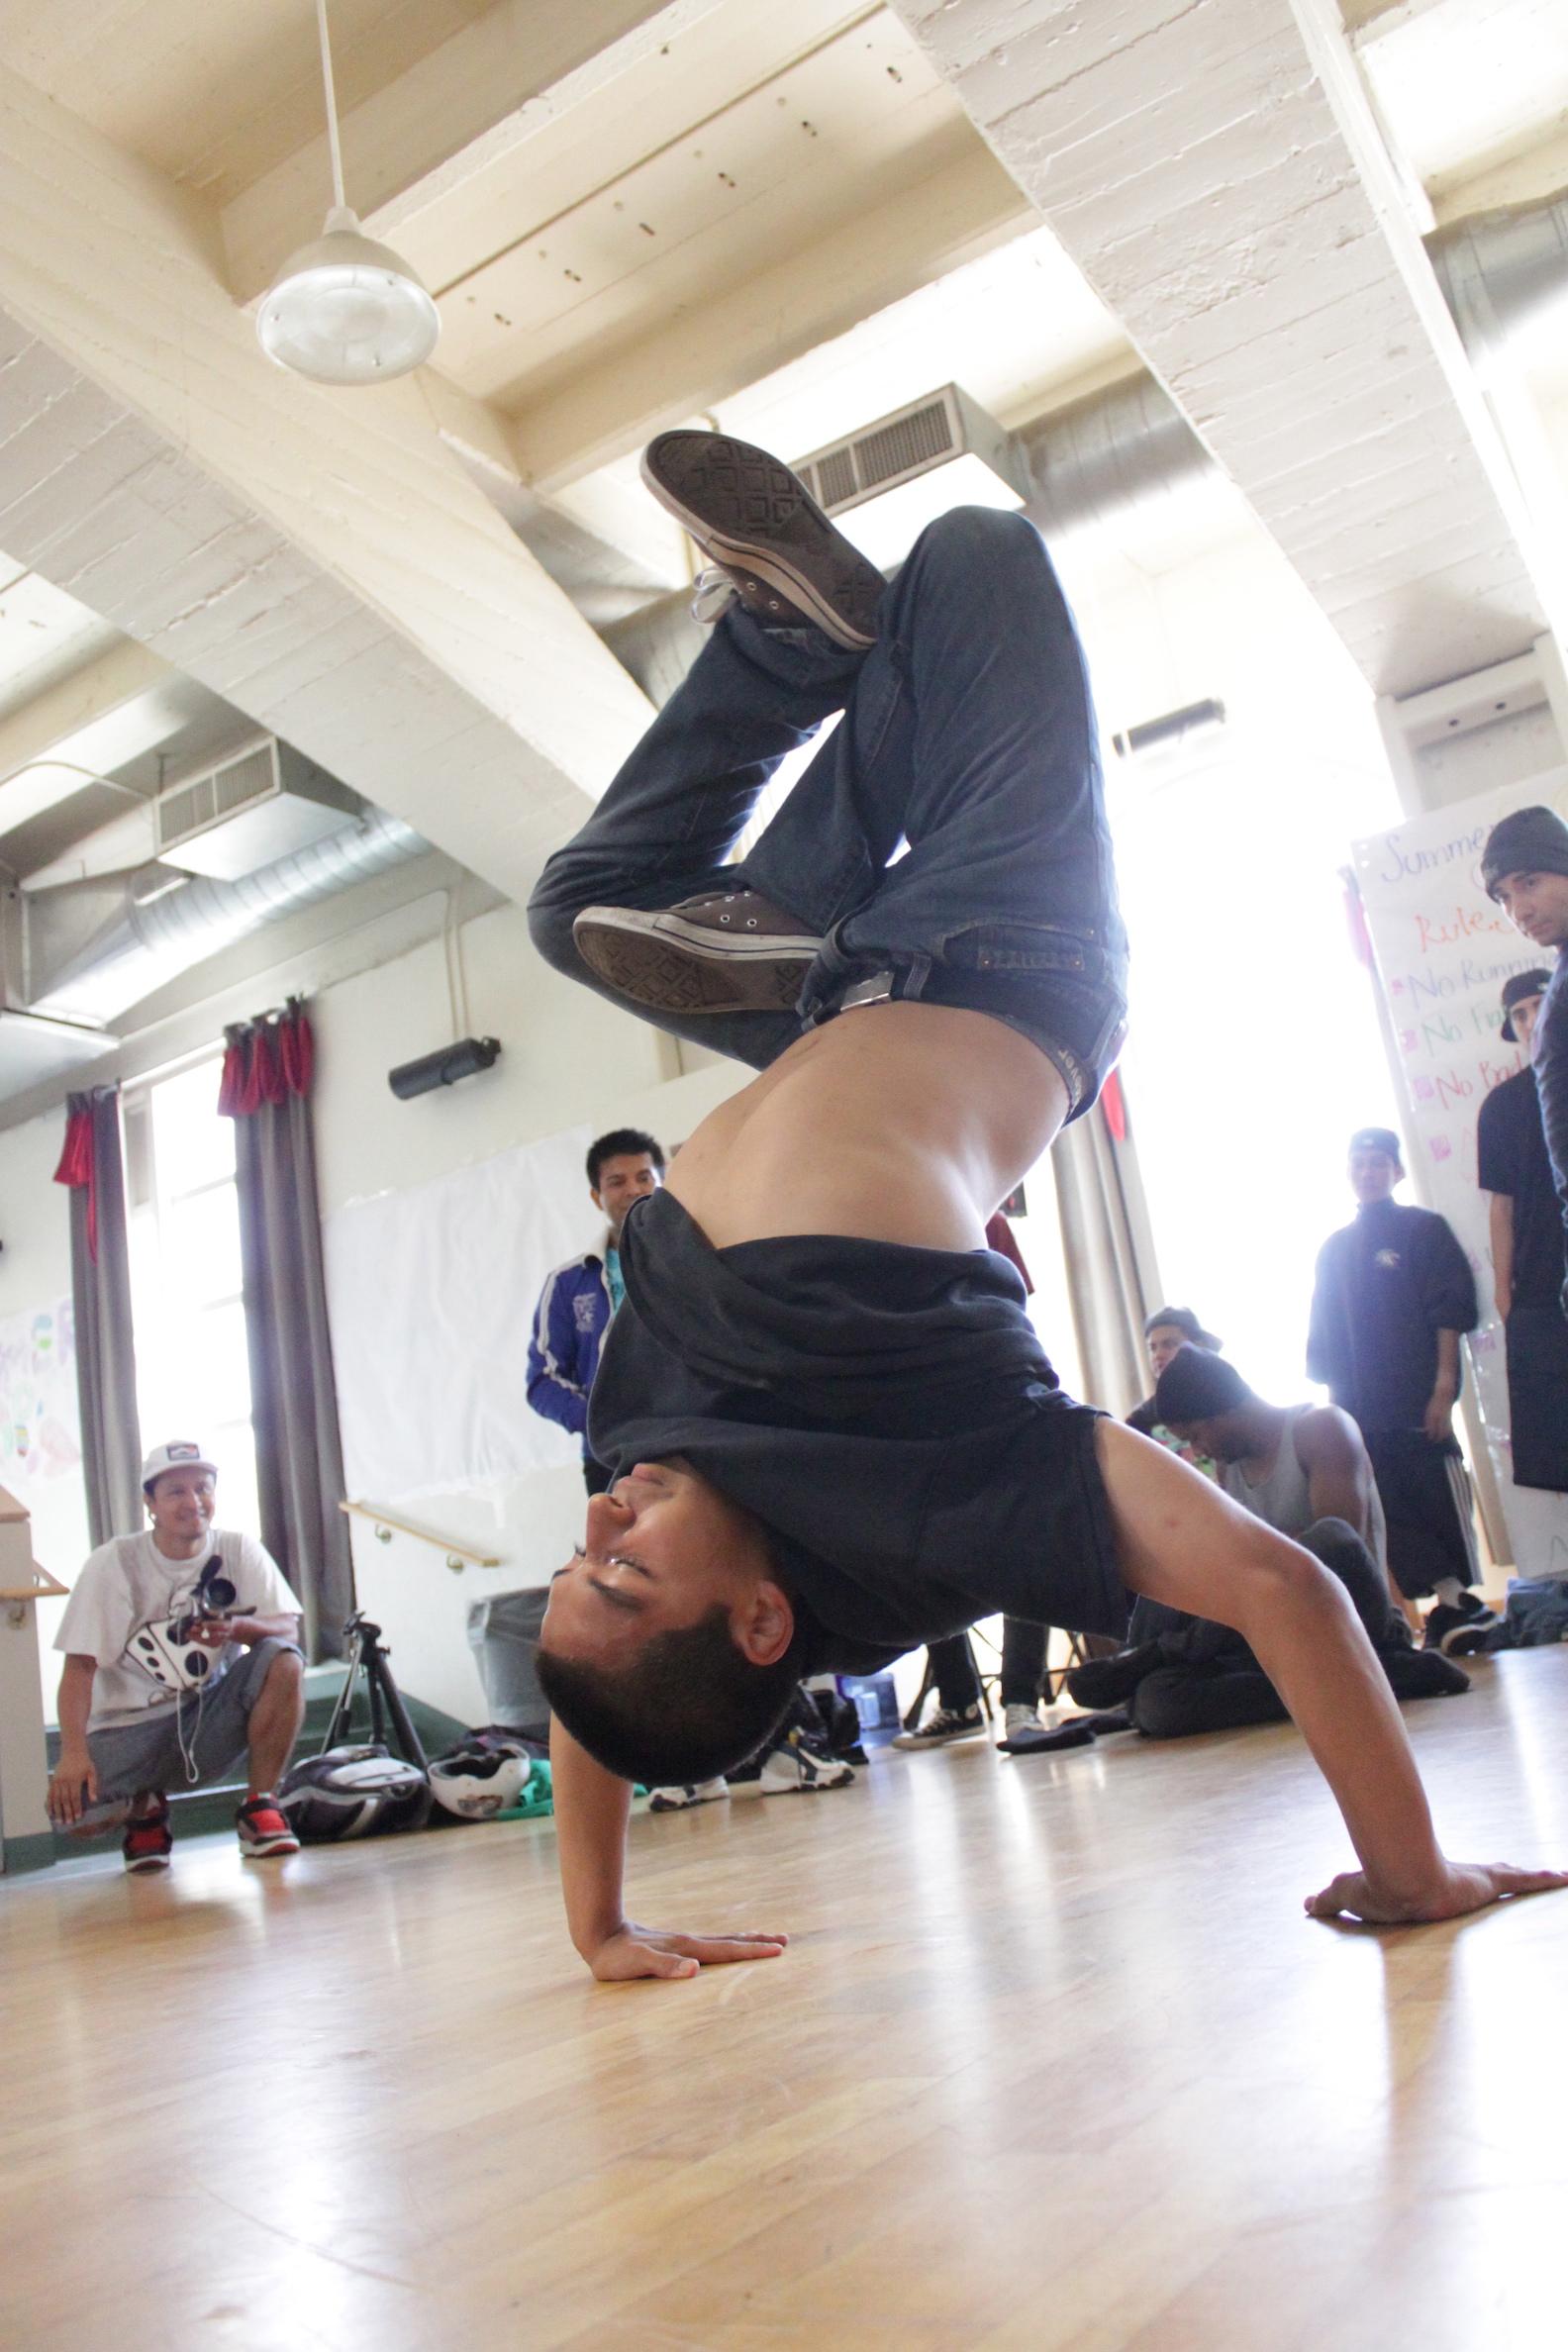 JUiCE Los Angeles Hip Hop Nonprofit Breakdance Music Art Community Youth Breakdance Los Angeles Bbboying Freeze.jpg